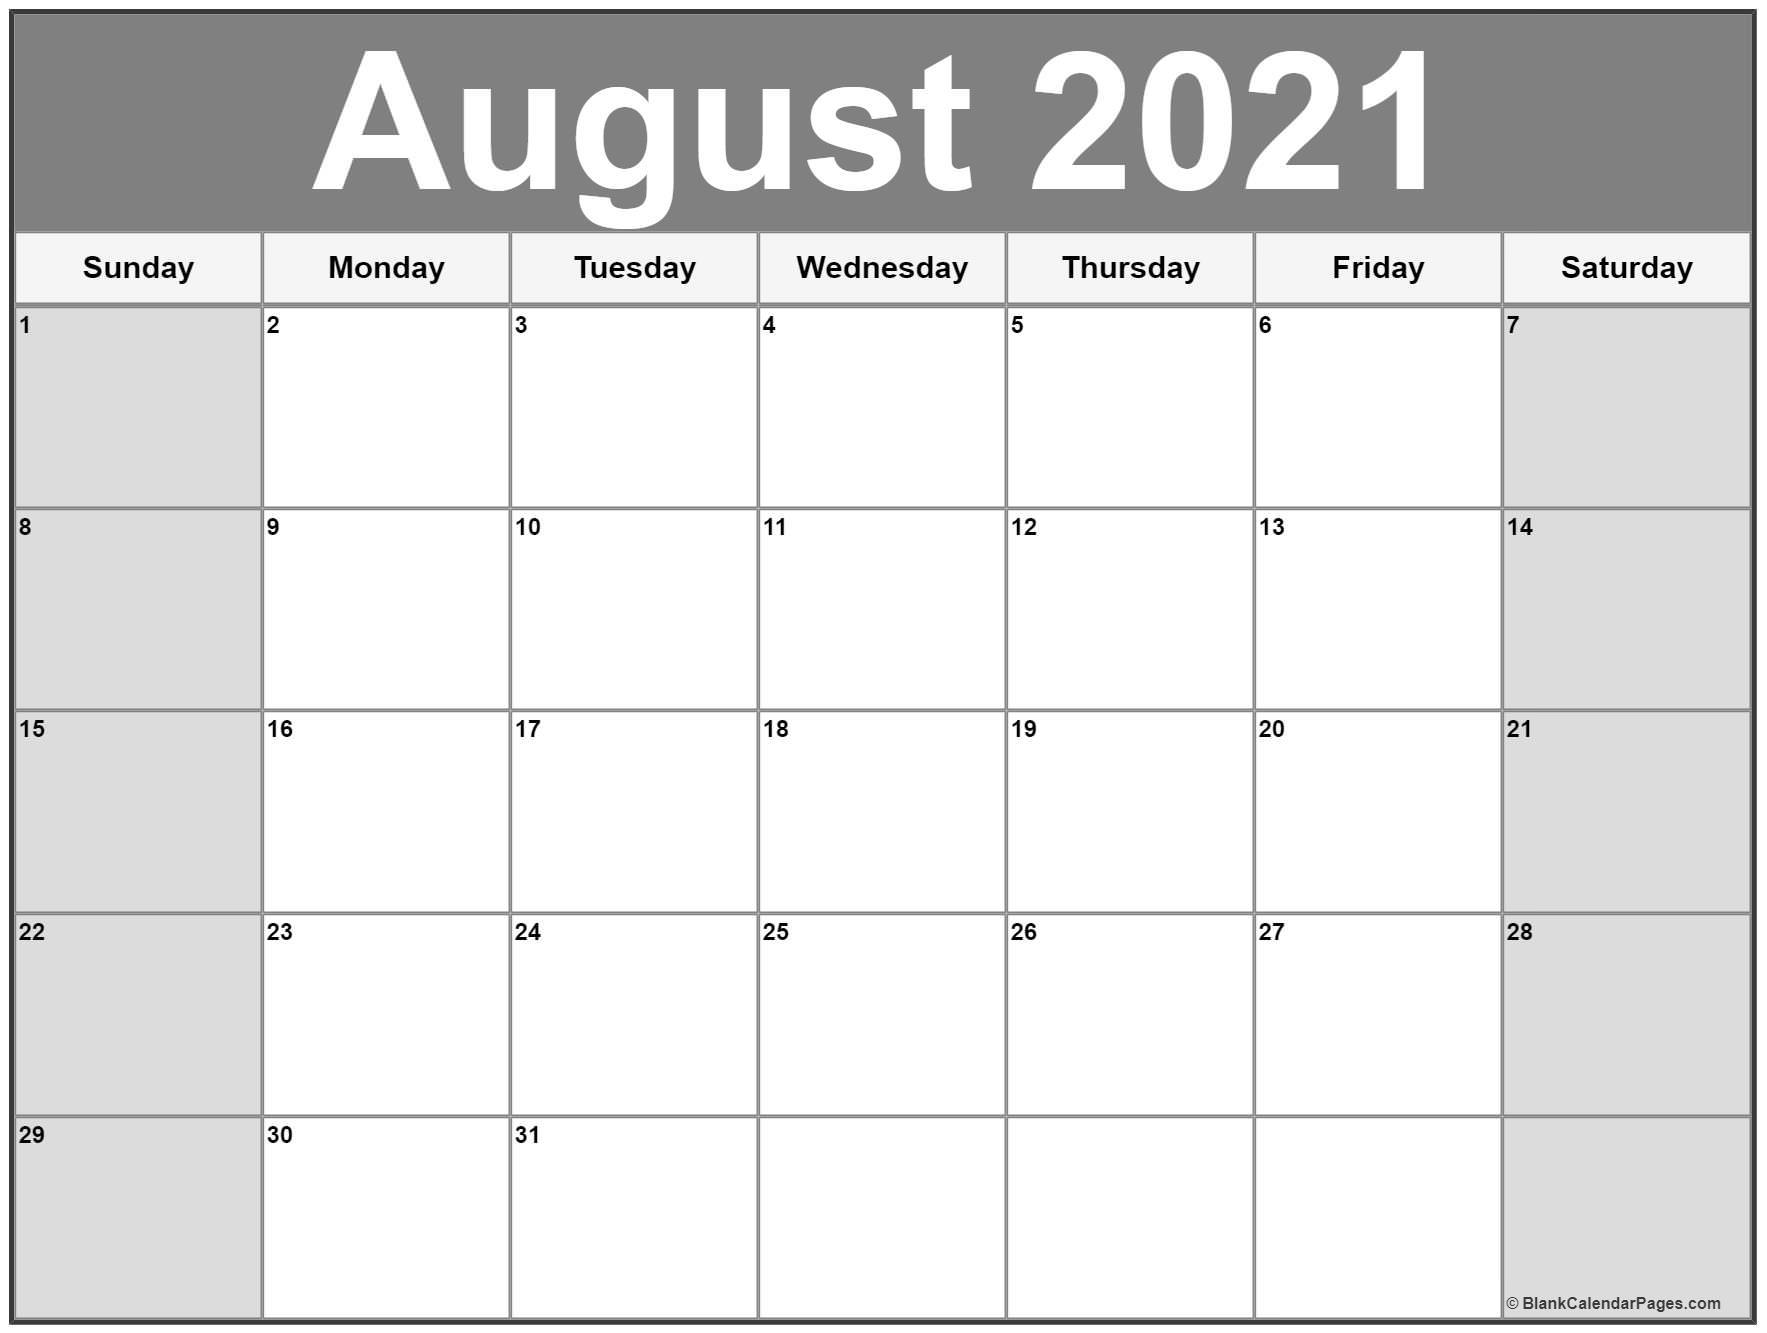 Pick Leo August 2021 Calender